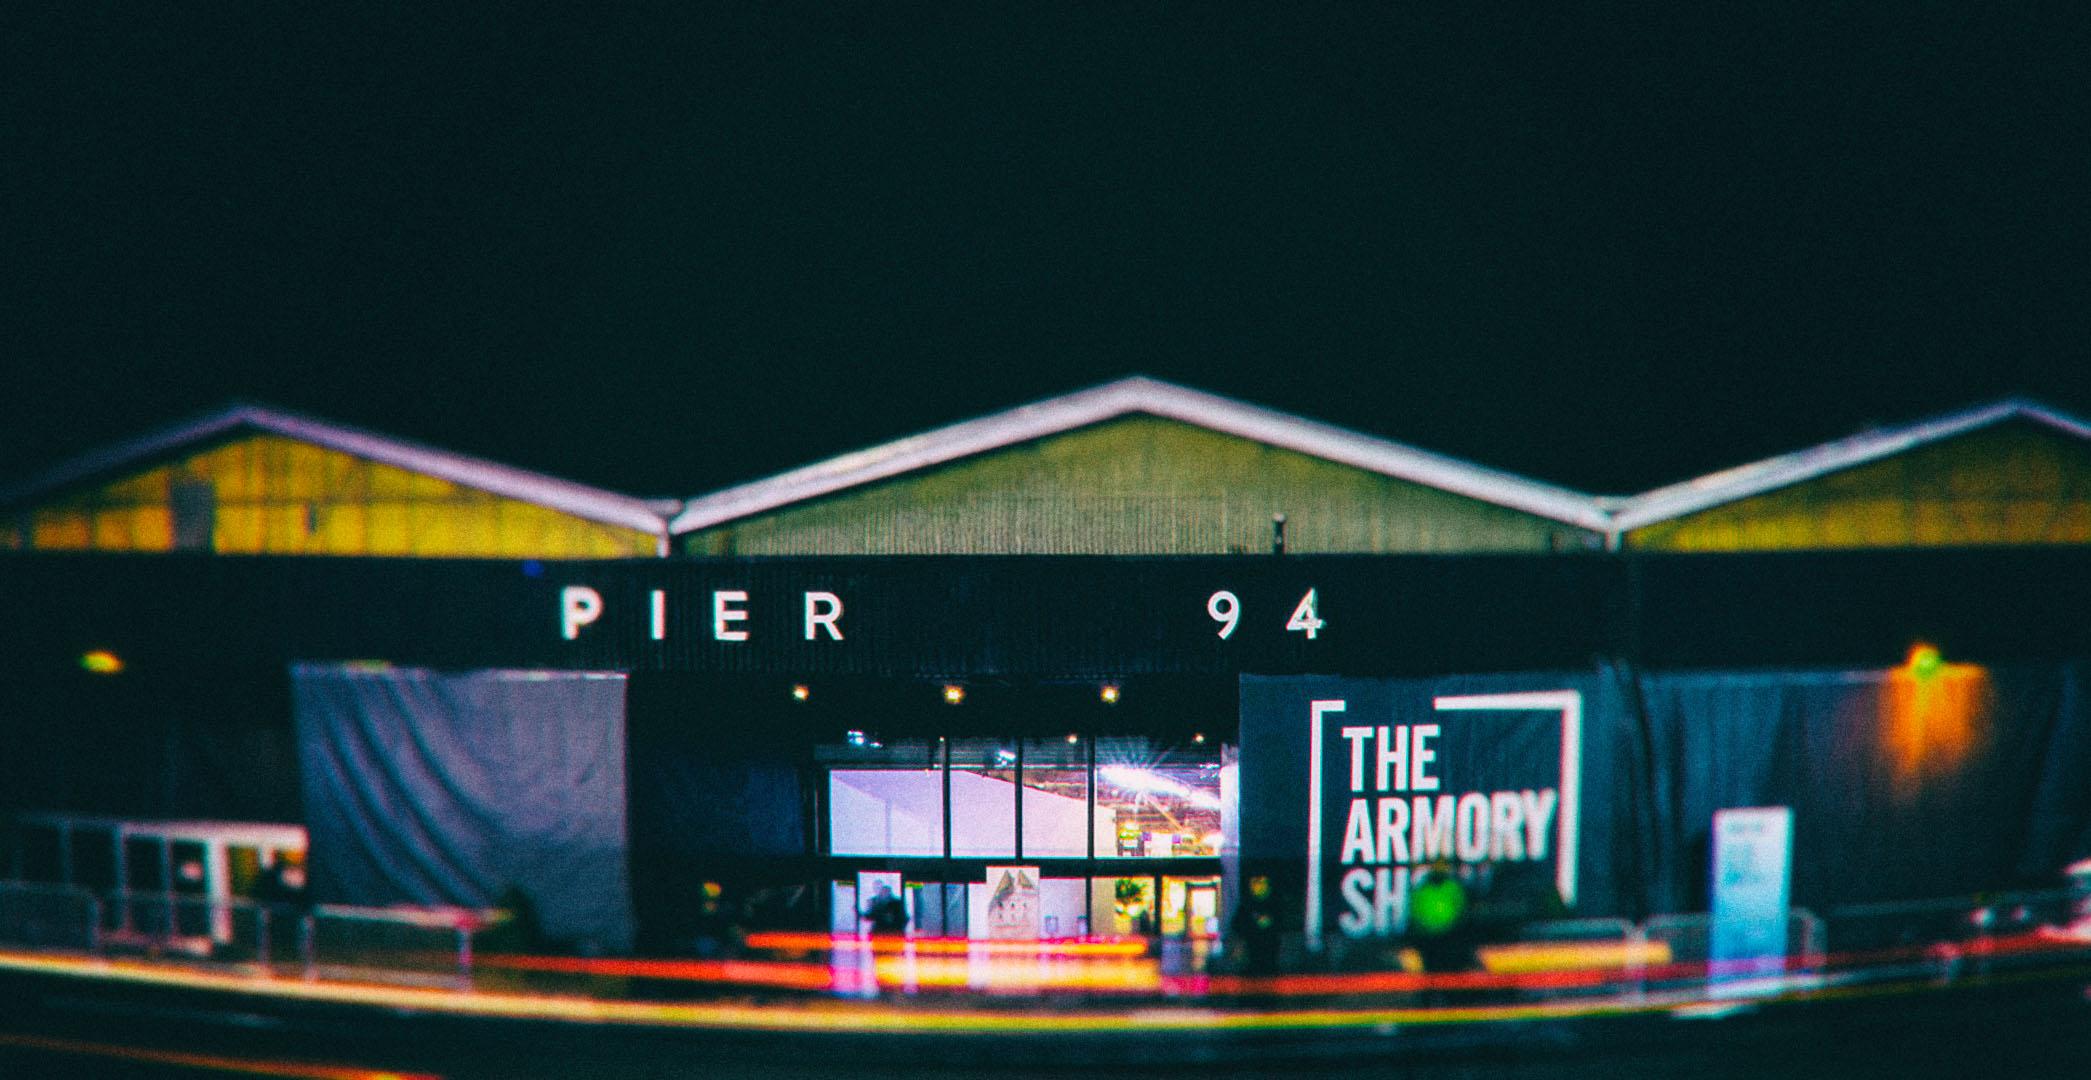 Armory Show:下午五点,我们重新开始